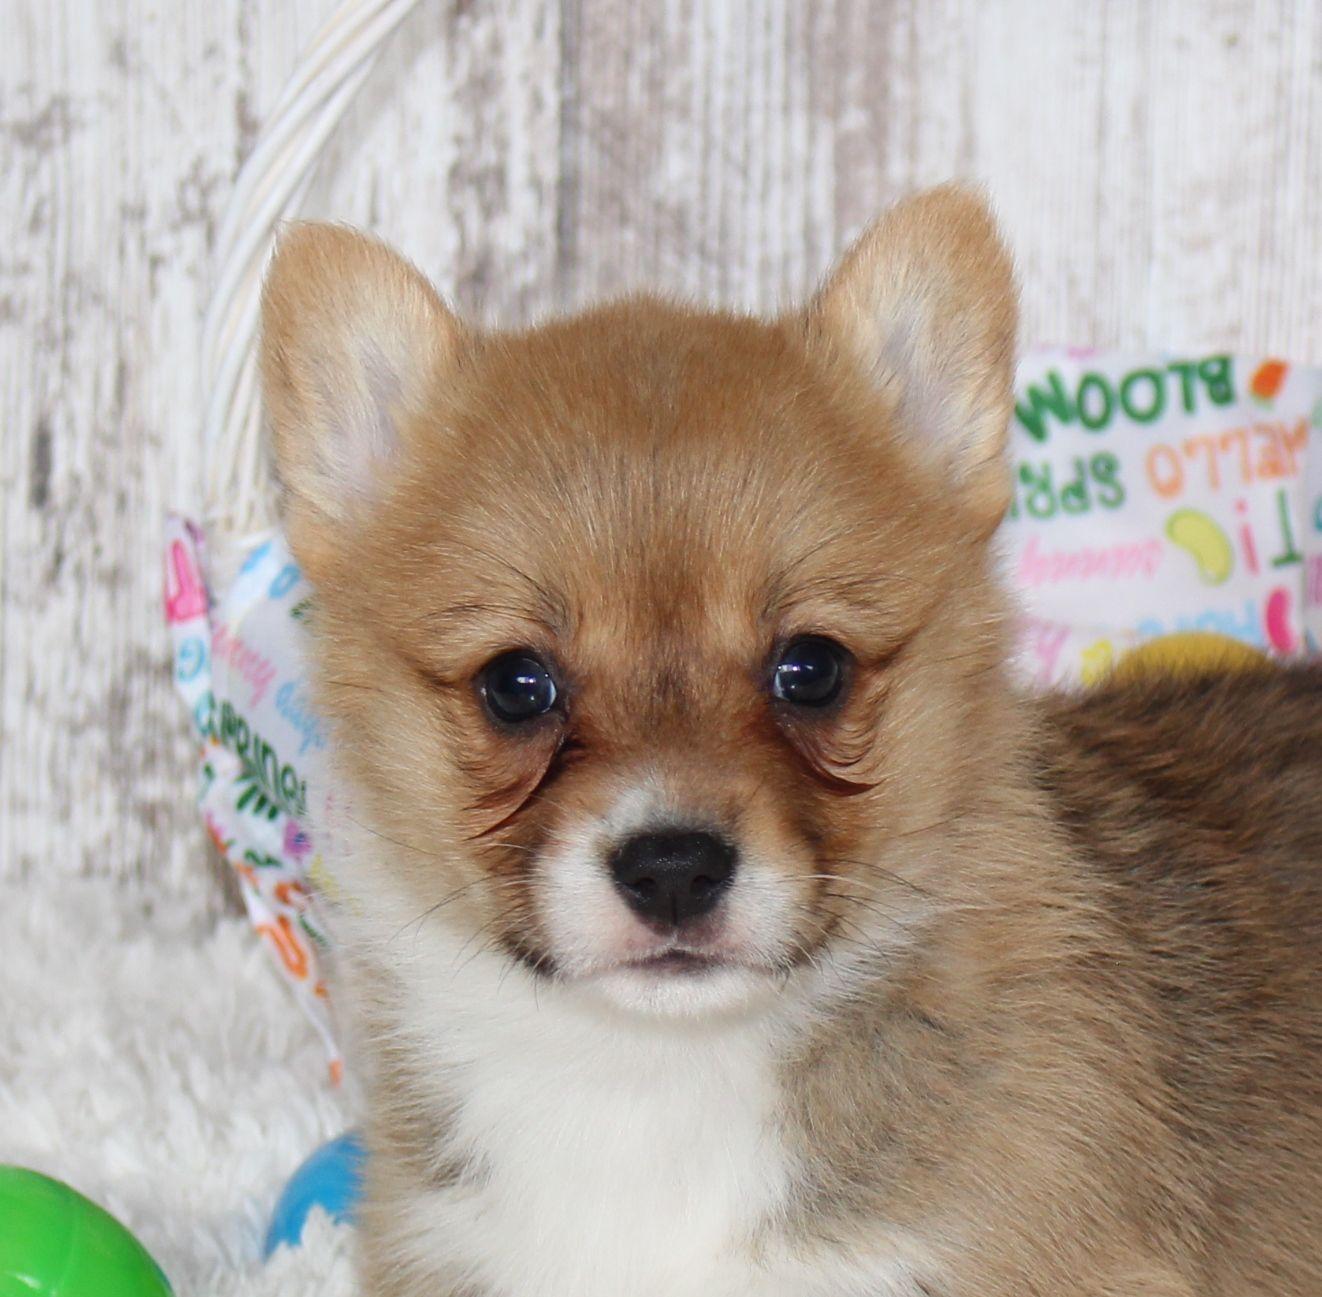 Cade Male Pembroke Welsh Corgi Puppy For Sale In Indiana I M Cade A Charming Pemb Welsh Corgi Puppies Pembroke Welsh Corgi Puppies Corgi Puppies For Sale